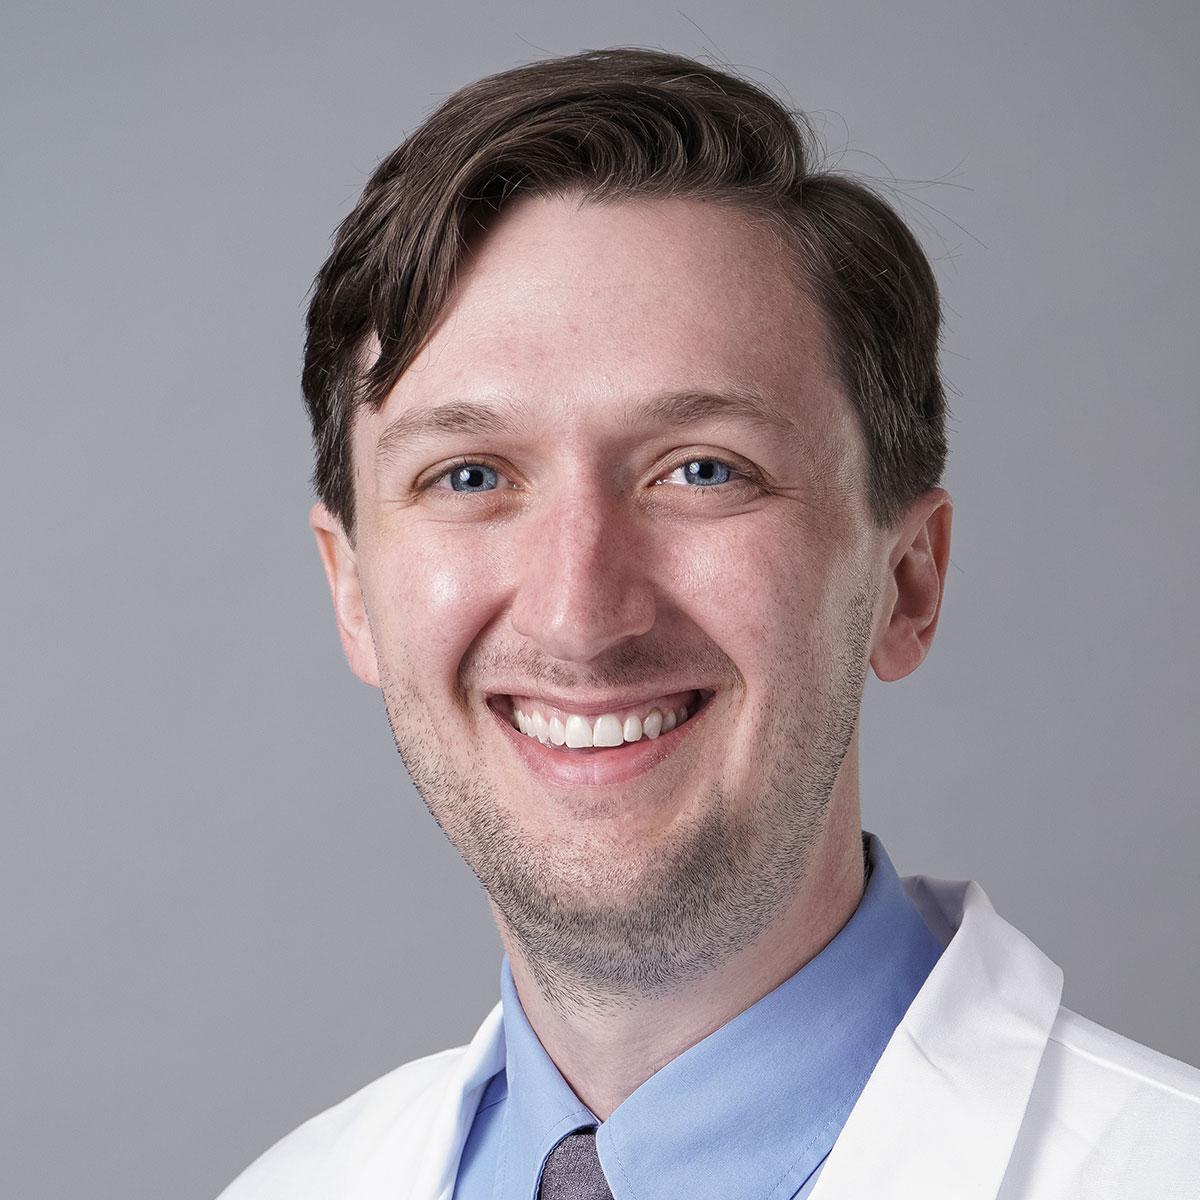 A friendly headshot of Dr. Clay Rowe